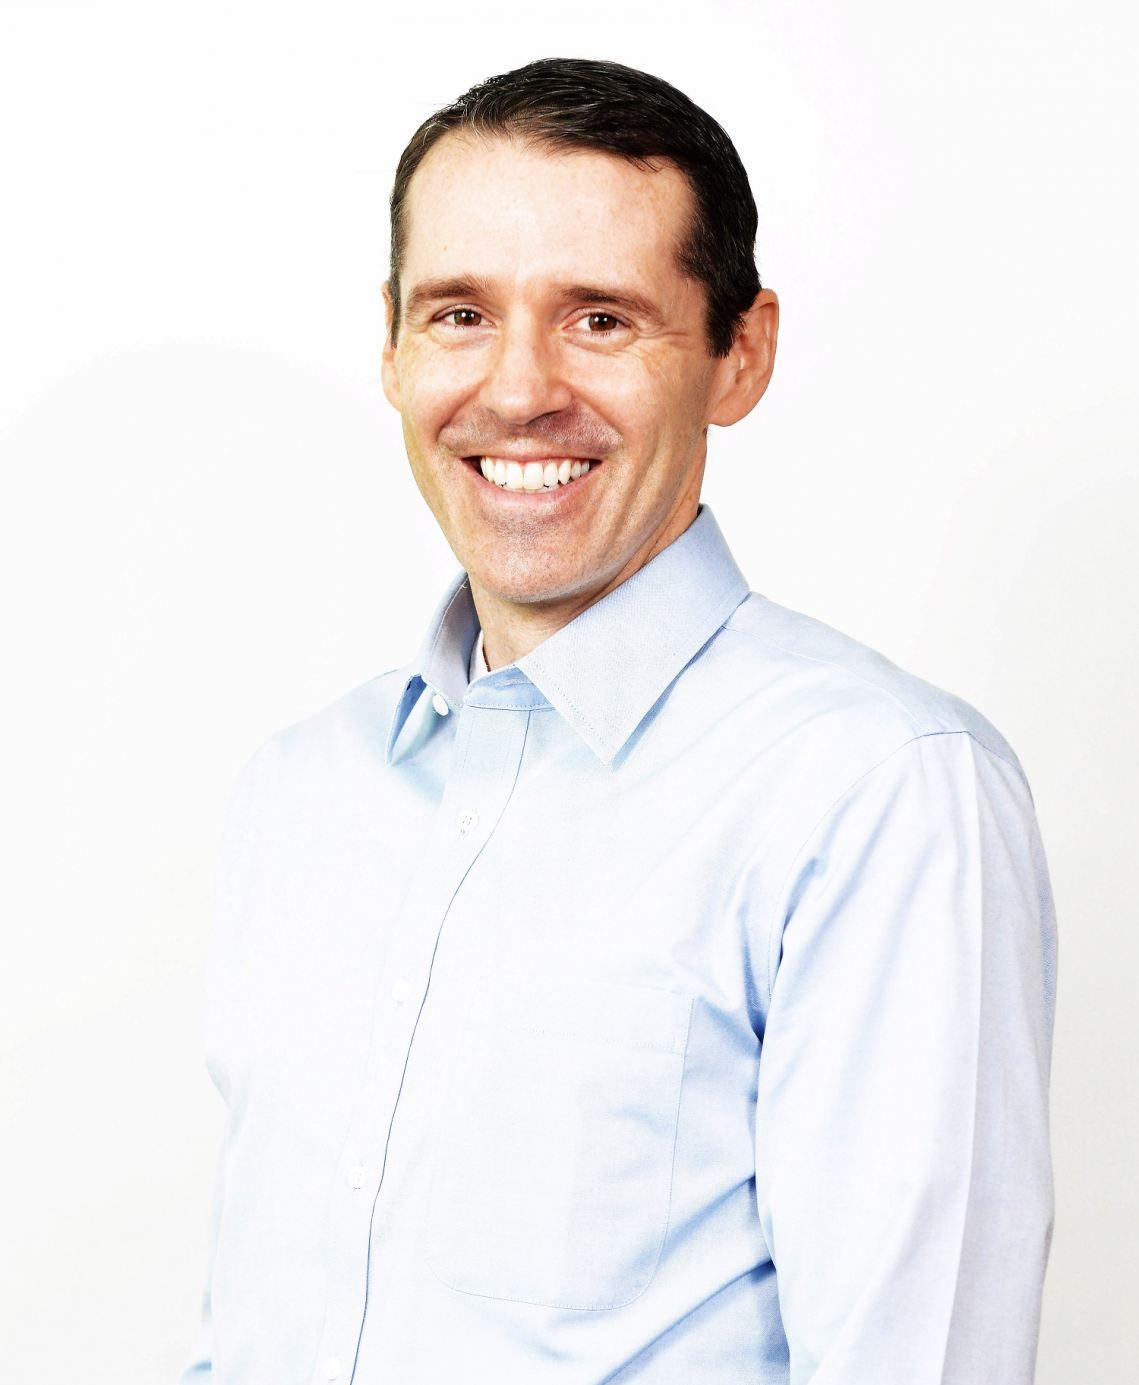 Jamie Harper Of Microsoft